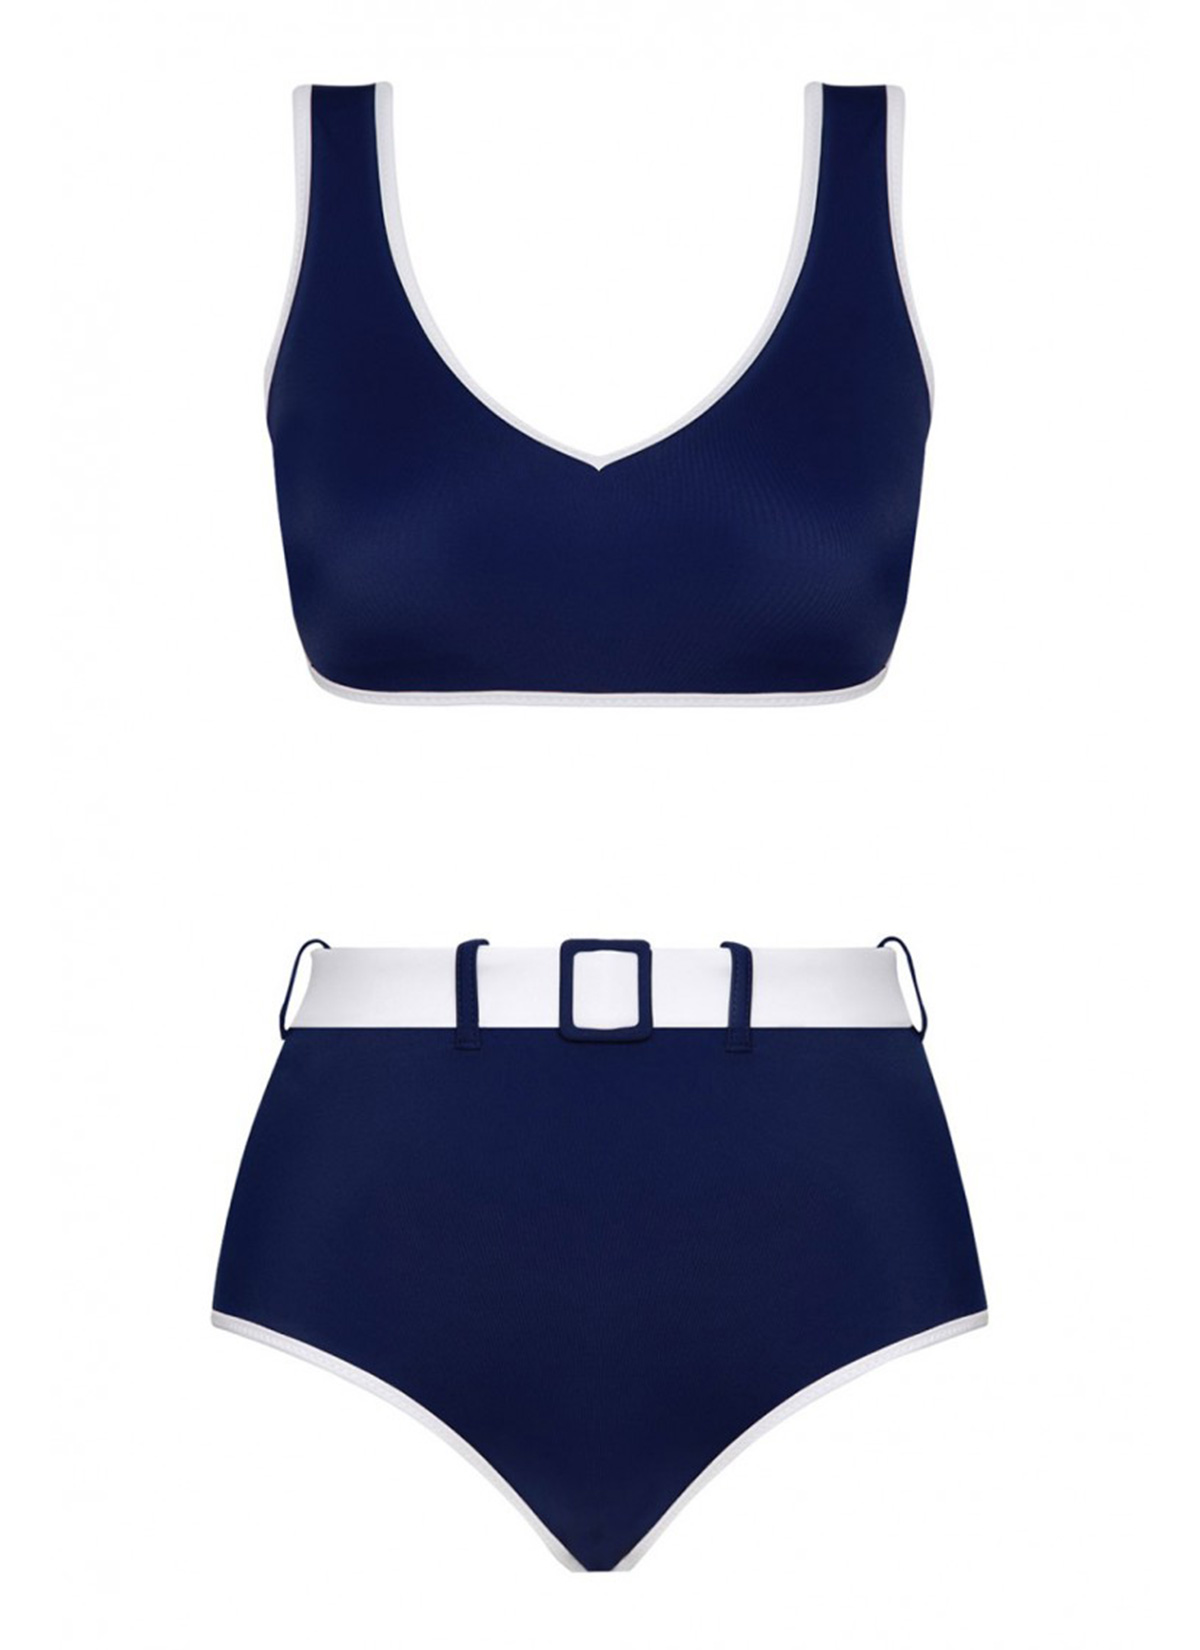 Ava Two-Tone Econyl Lacivert Bikini